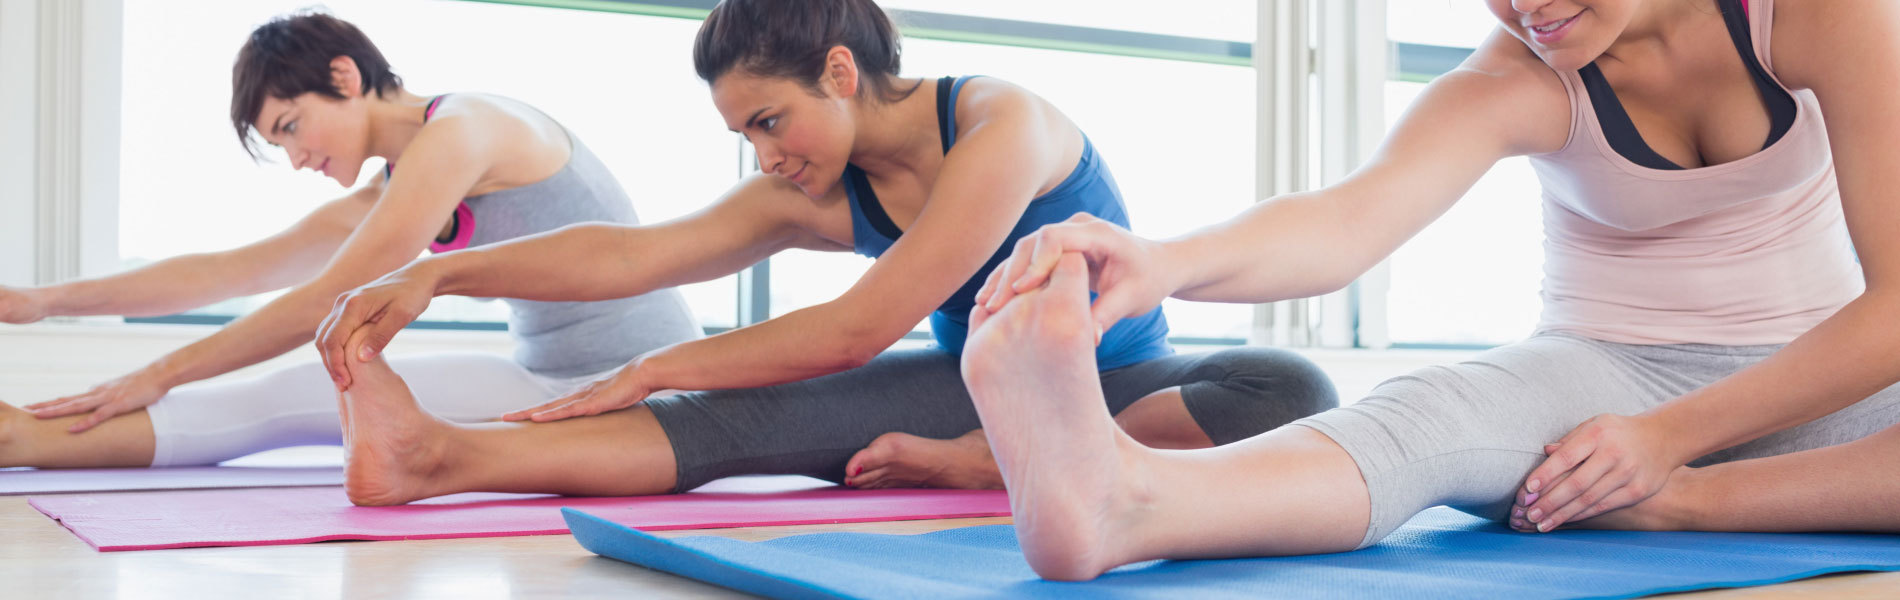 influencer marketing campaigns for Yoga Studio